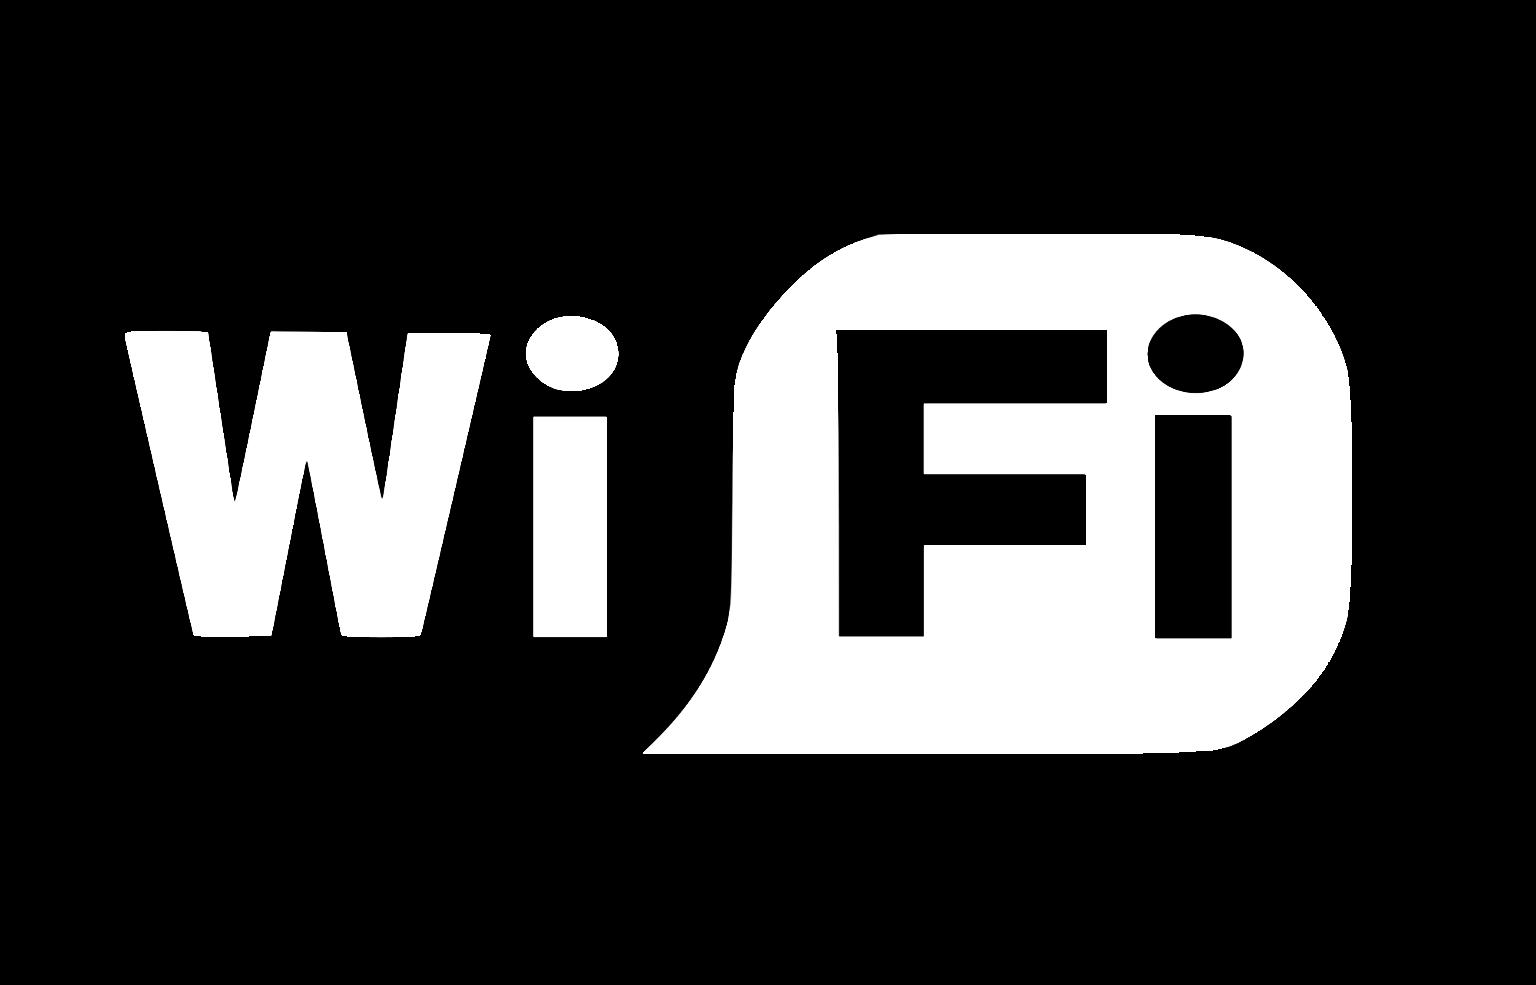 11wifi